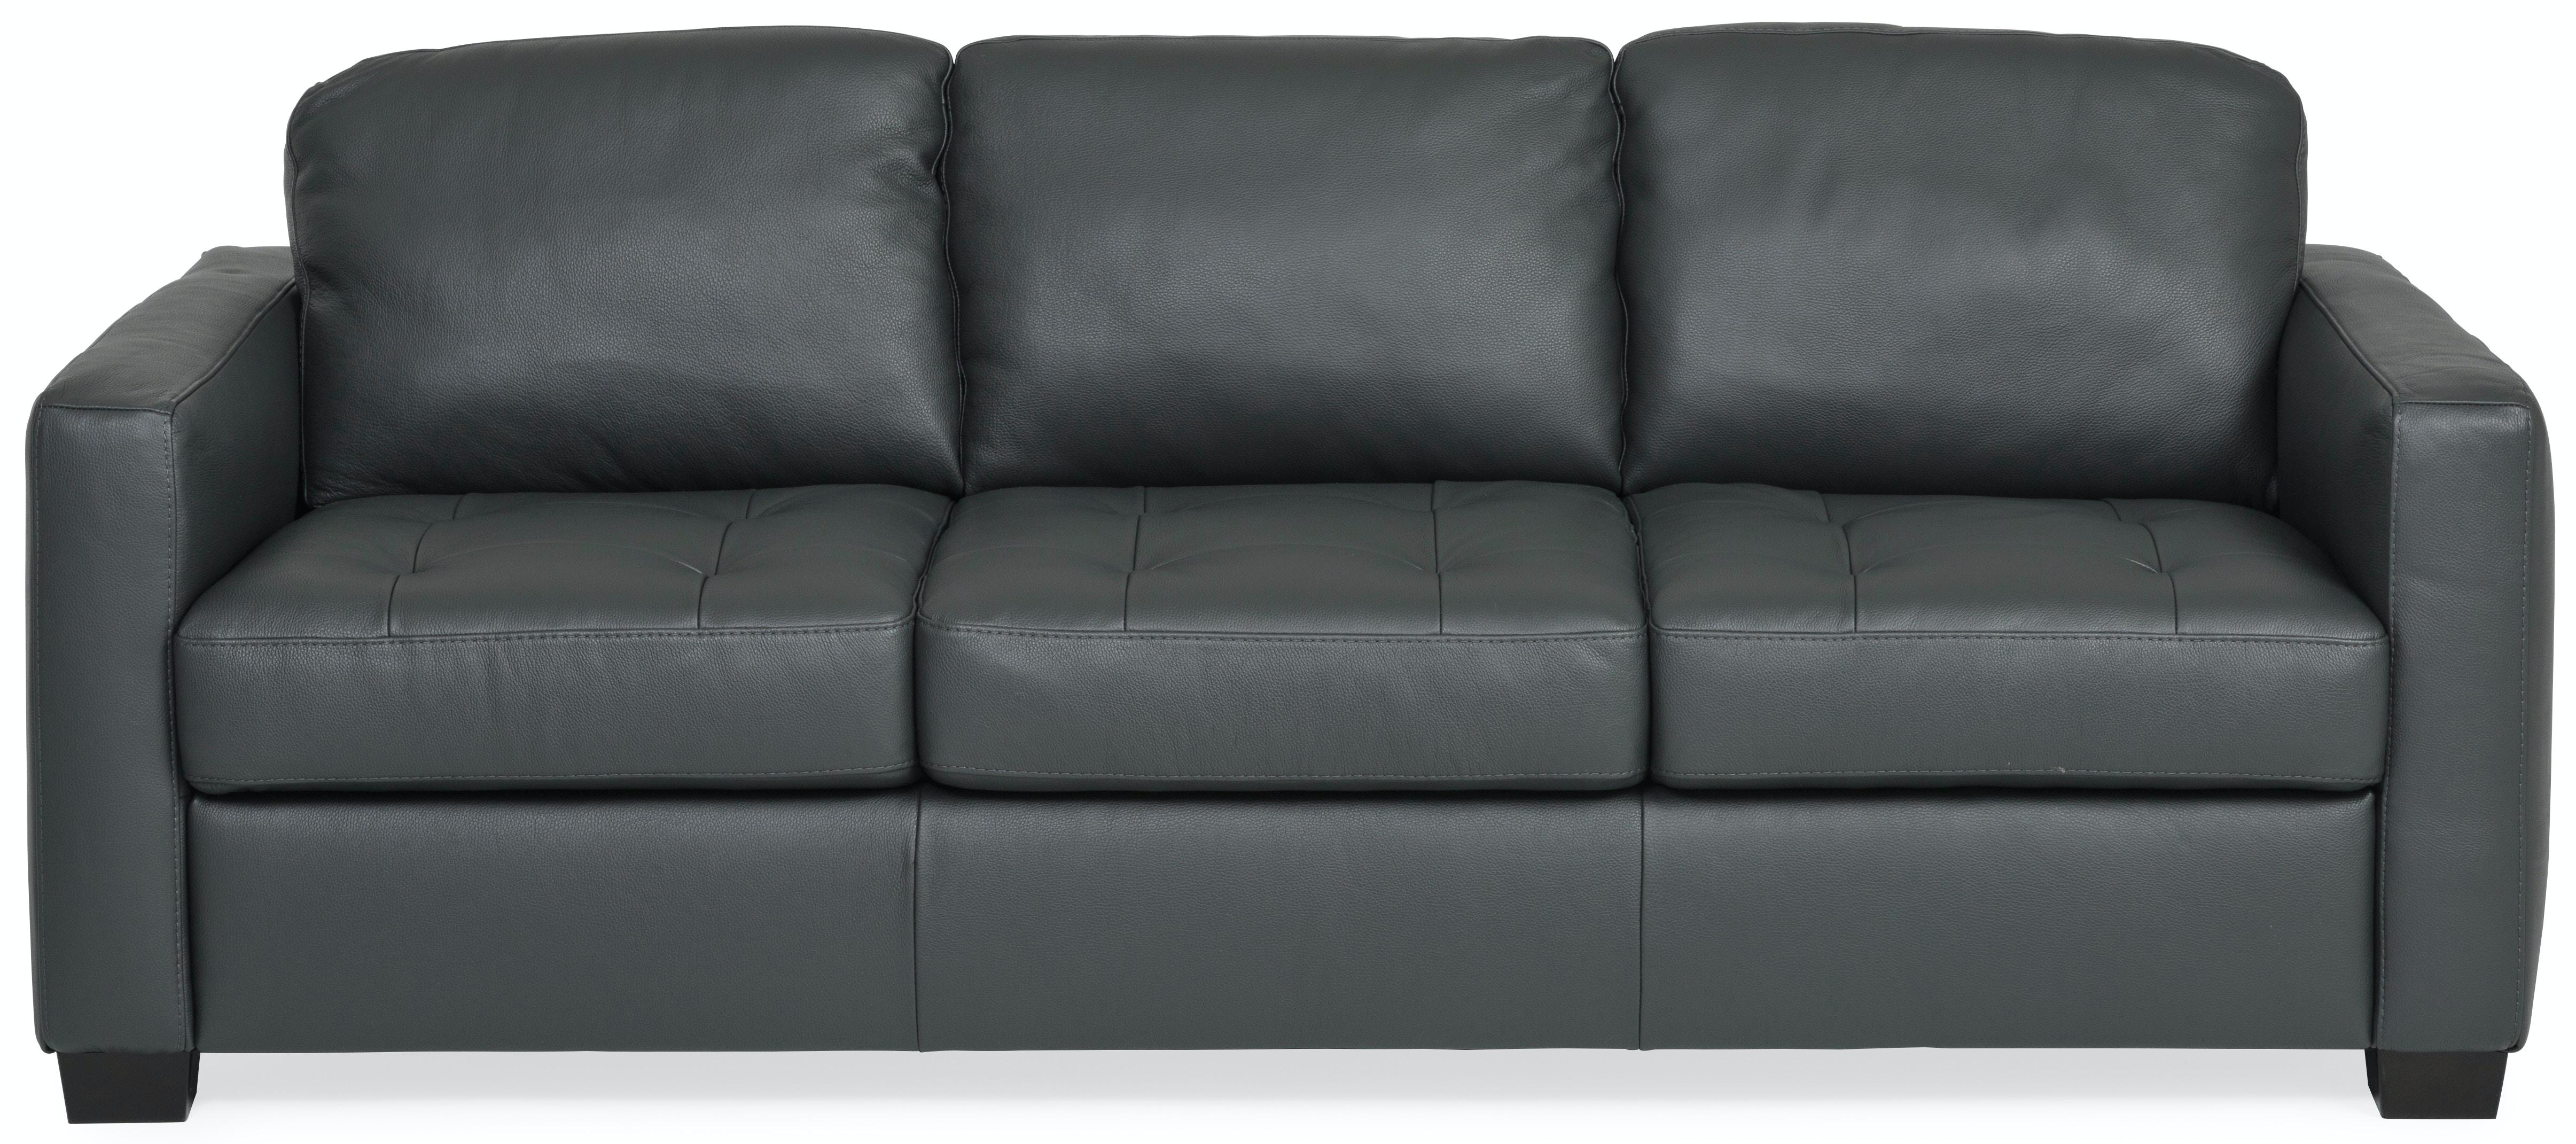 Merveilleux Denver Leather Sofa   ANTHRACITE ST:411899